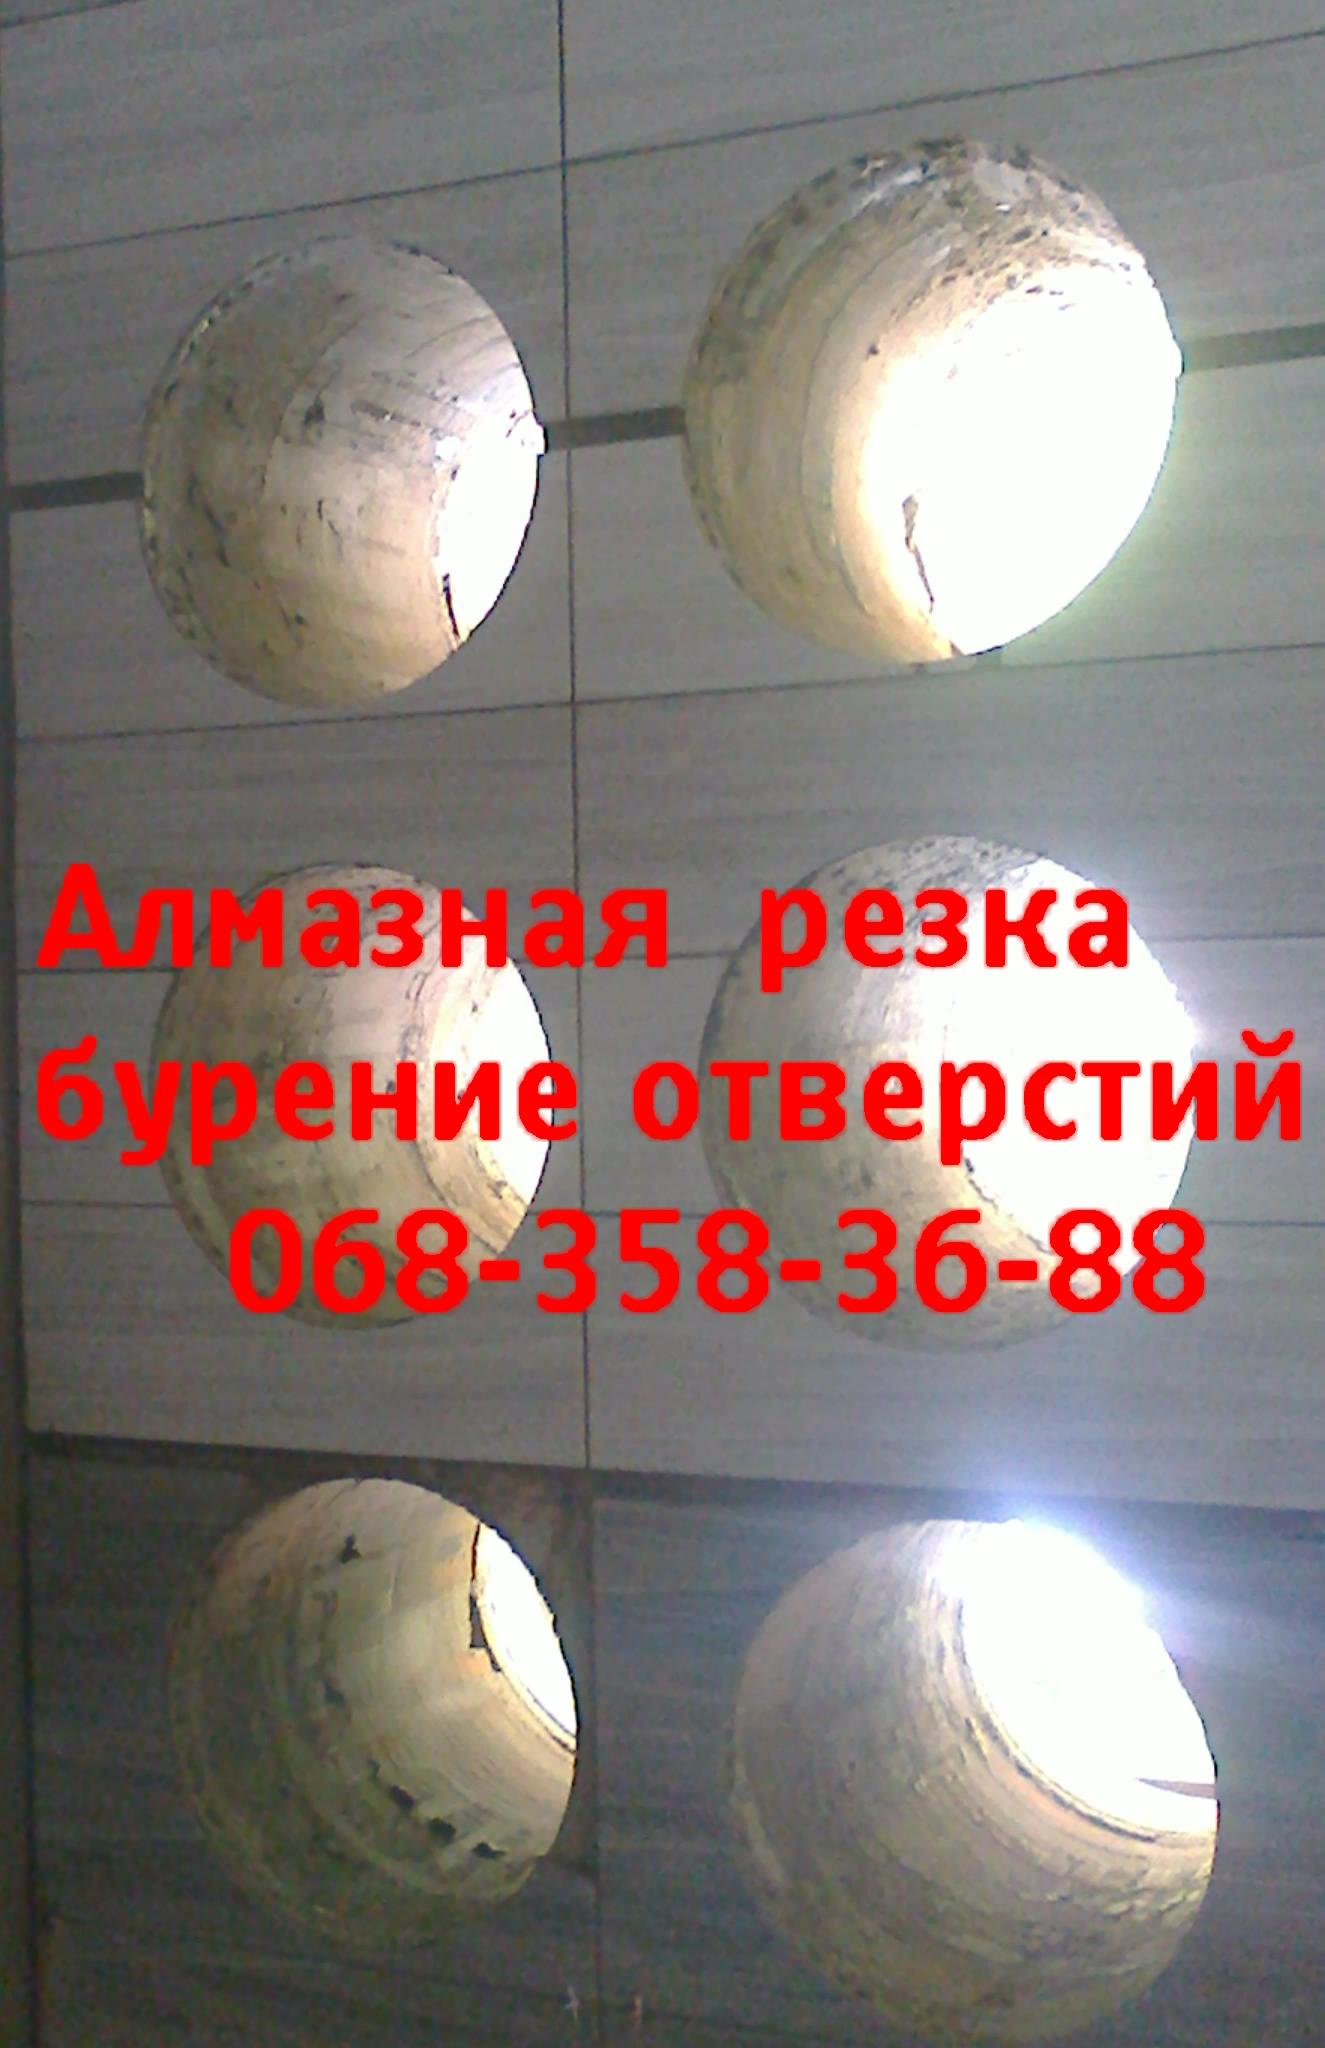 Нажмите на изображение для увеличения Название: Фото0087_001.jpg Просмотров: 11 Размер:248.9 Кб ID:595164